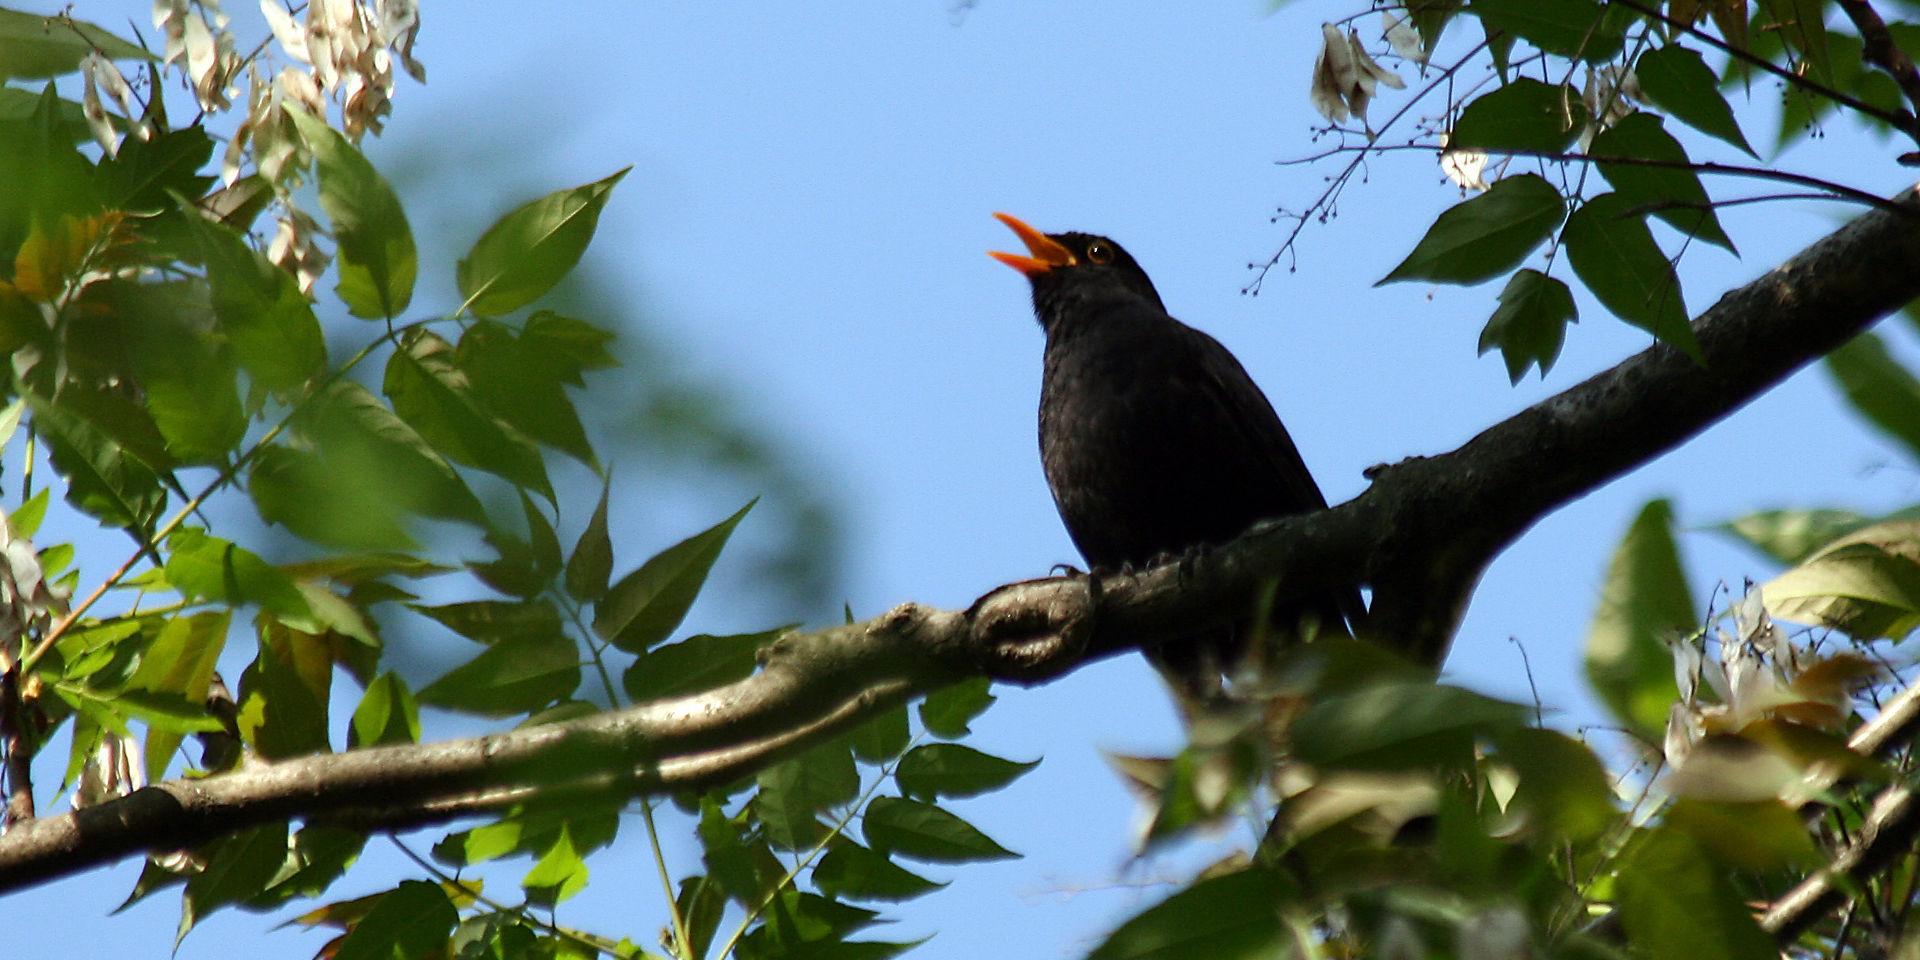 Blackbird singing. Photo credit: Alexander Wallnöfer via Free Images.